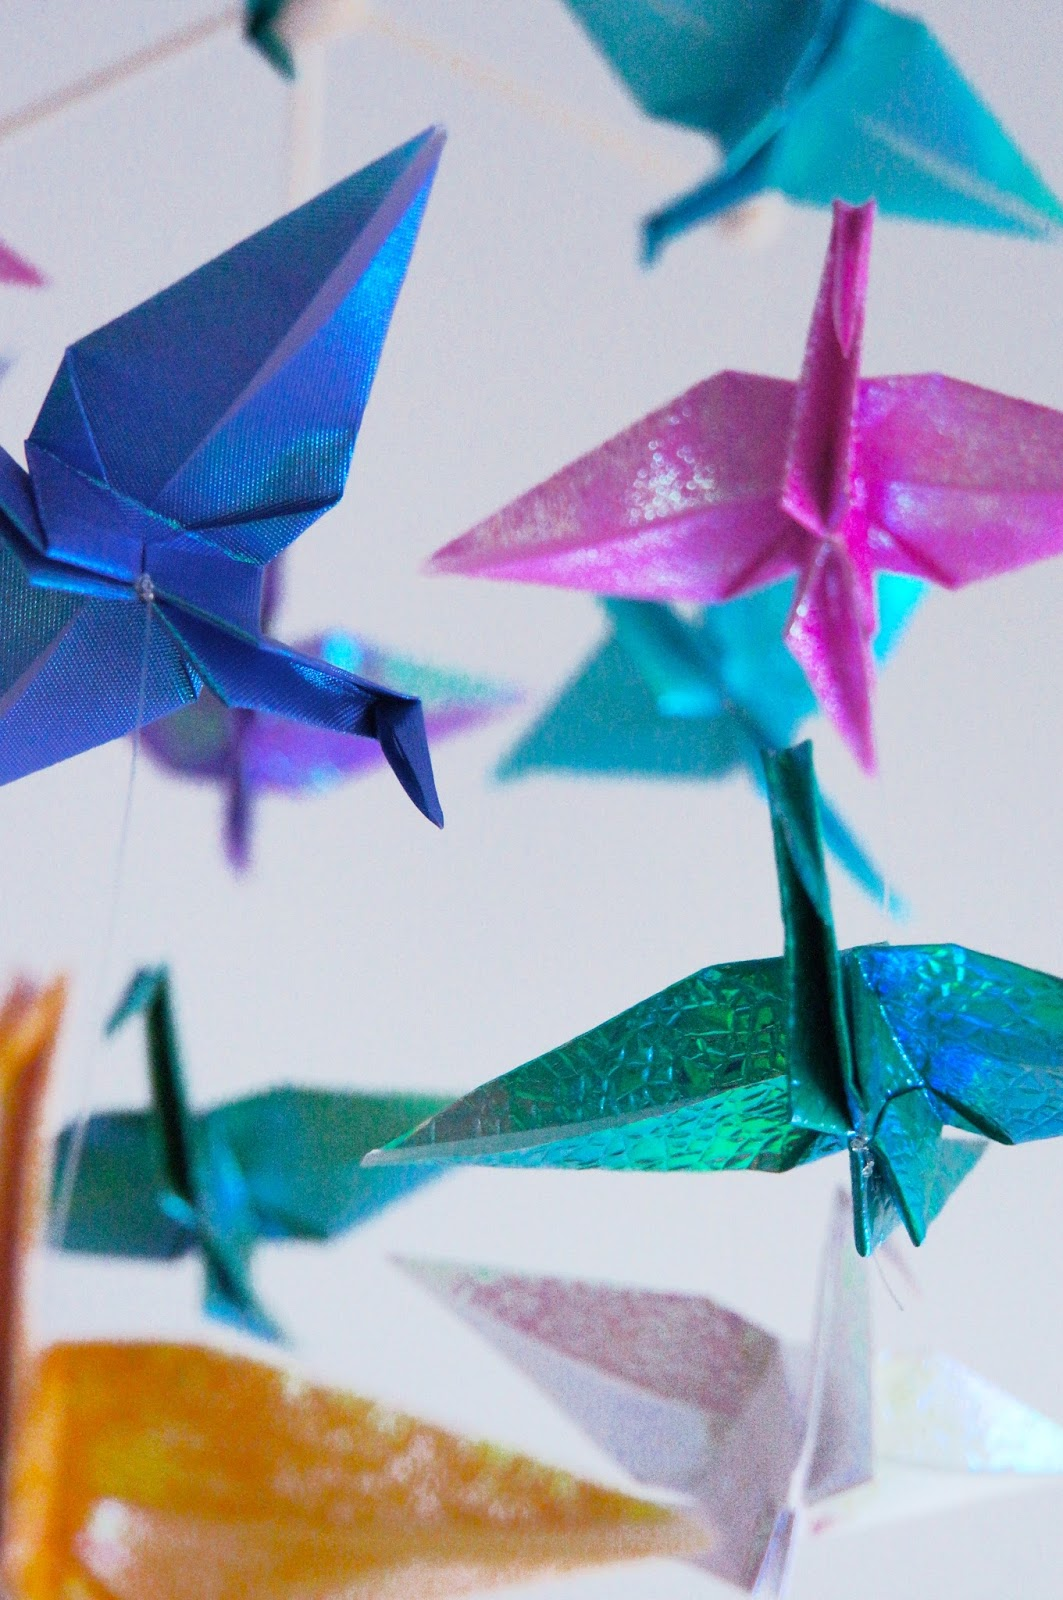 basteln malen kuchen backen origami kraniche mobile. Black Bedroom Furniture Sets. Home Design Ideas